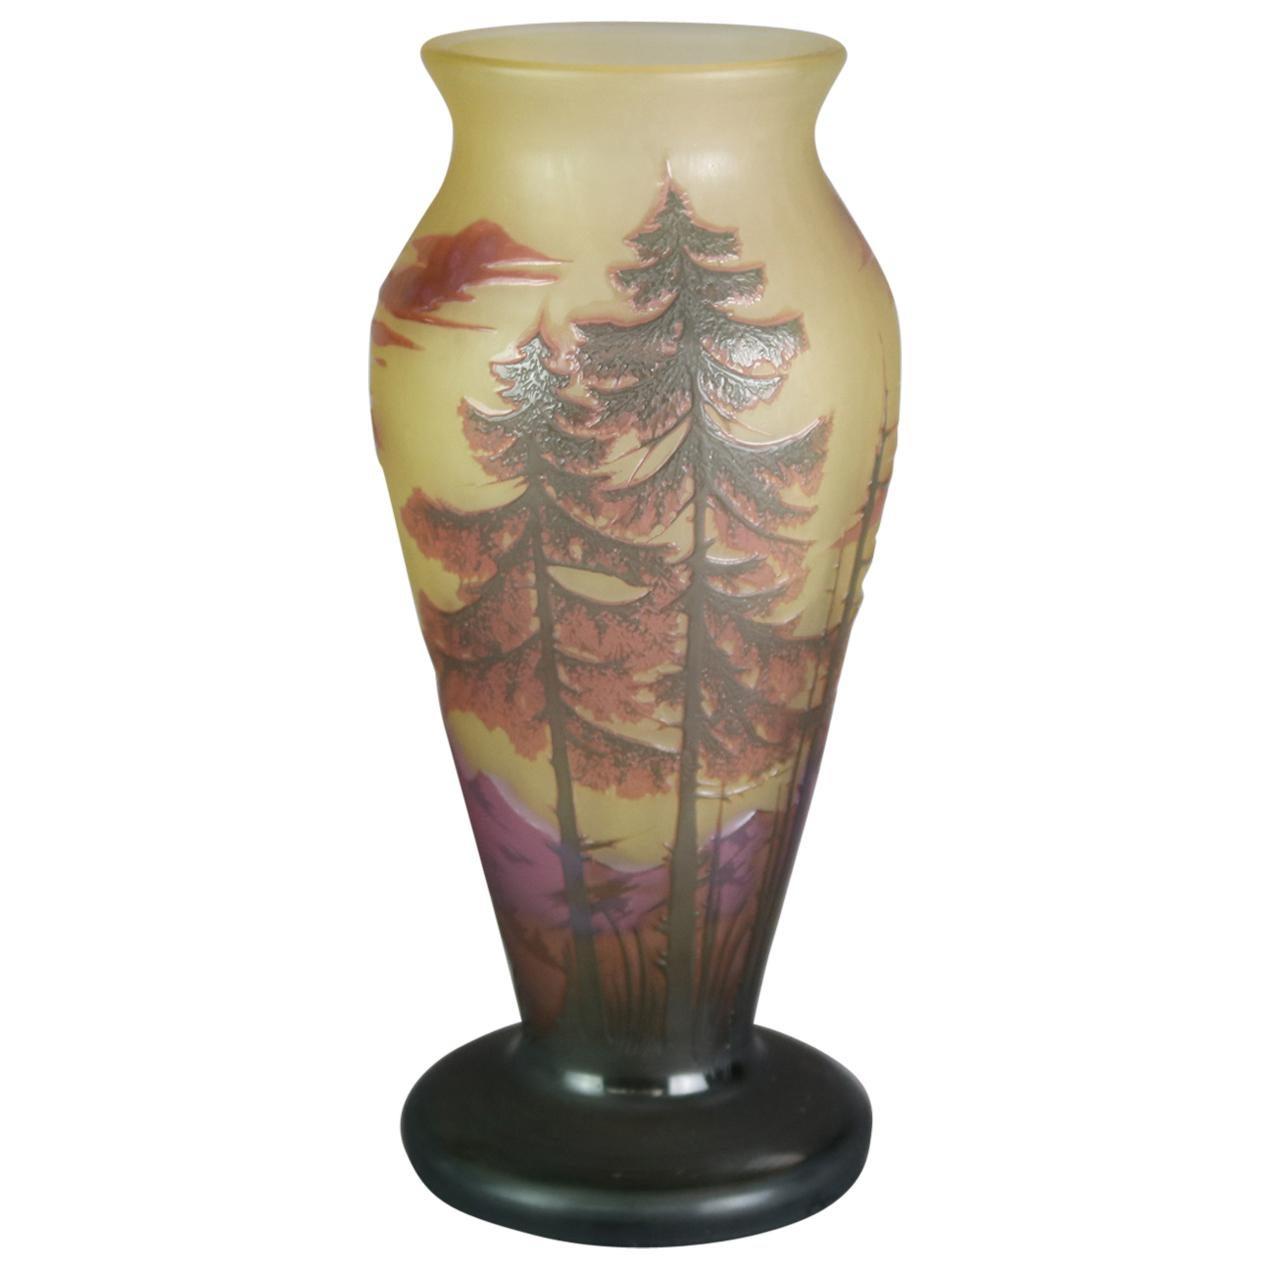 Antique French Dumochelle Cameo Cutback Landscape Art Glass Vase, circa 1900